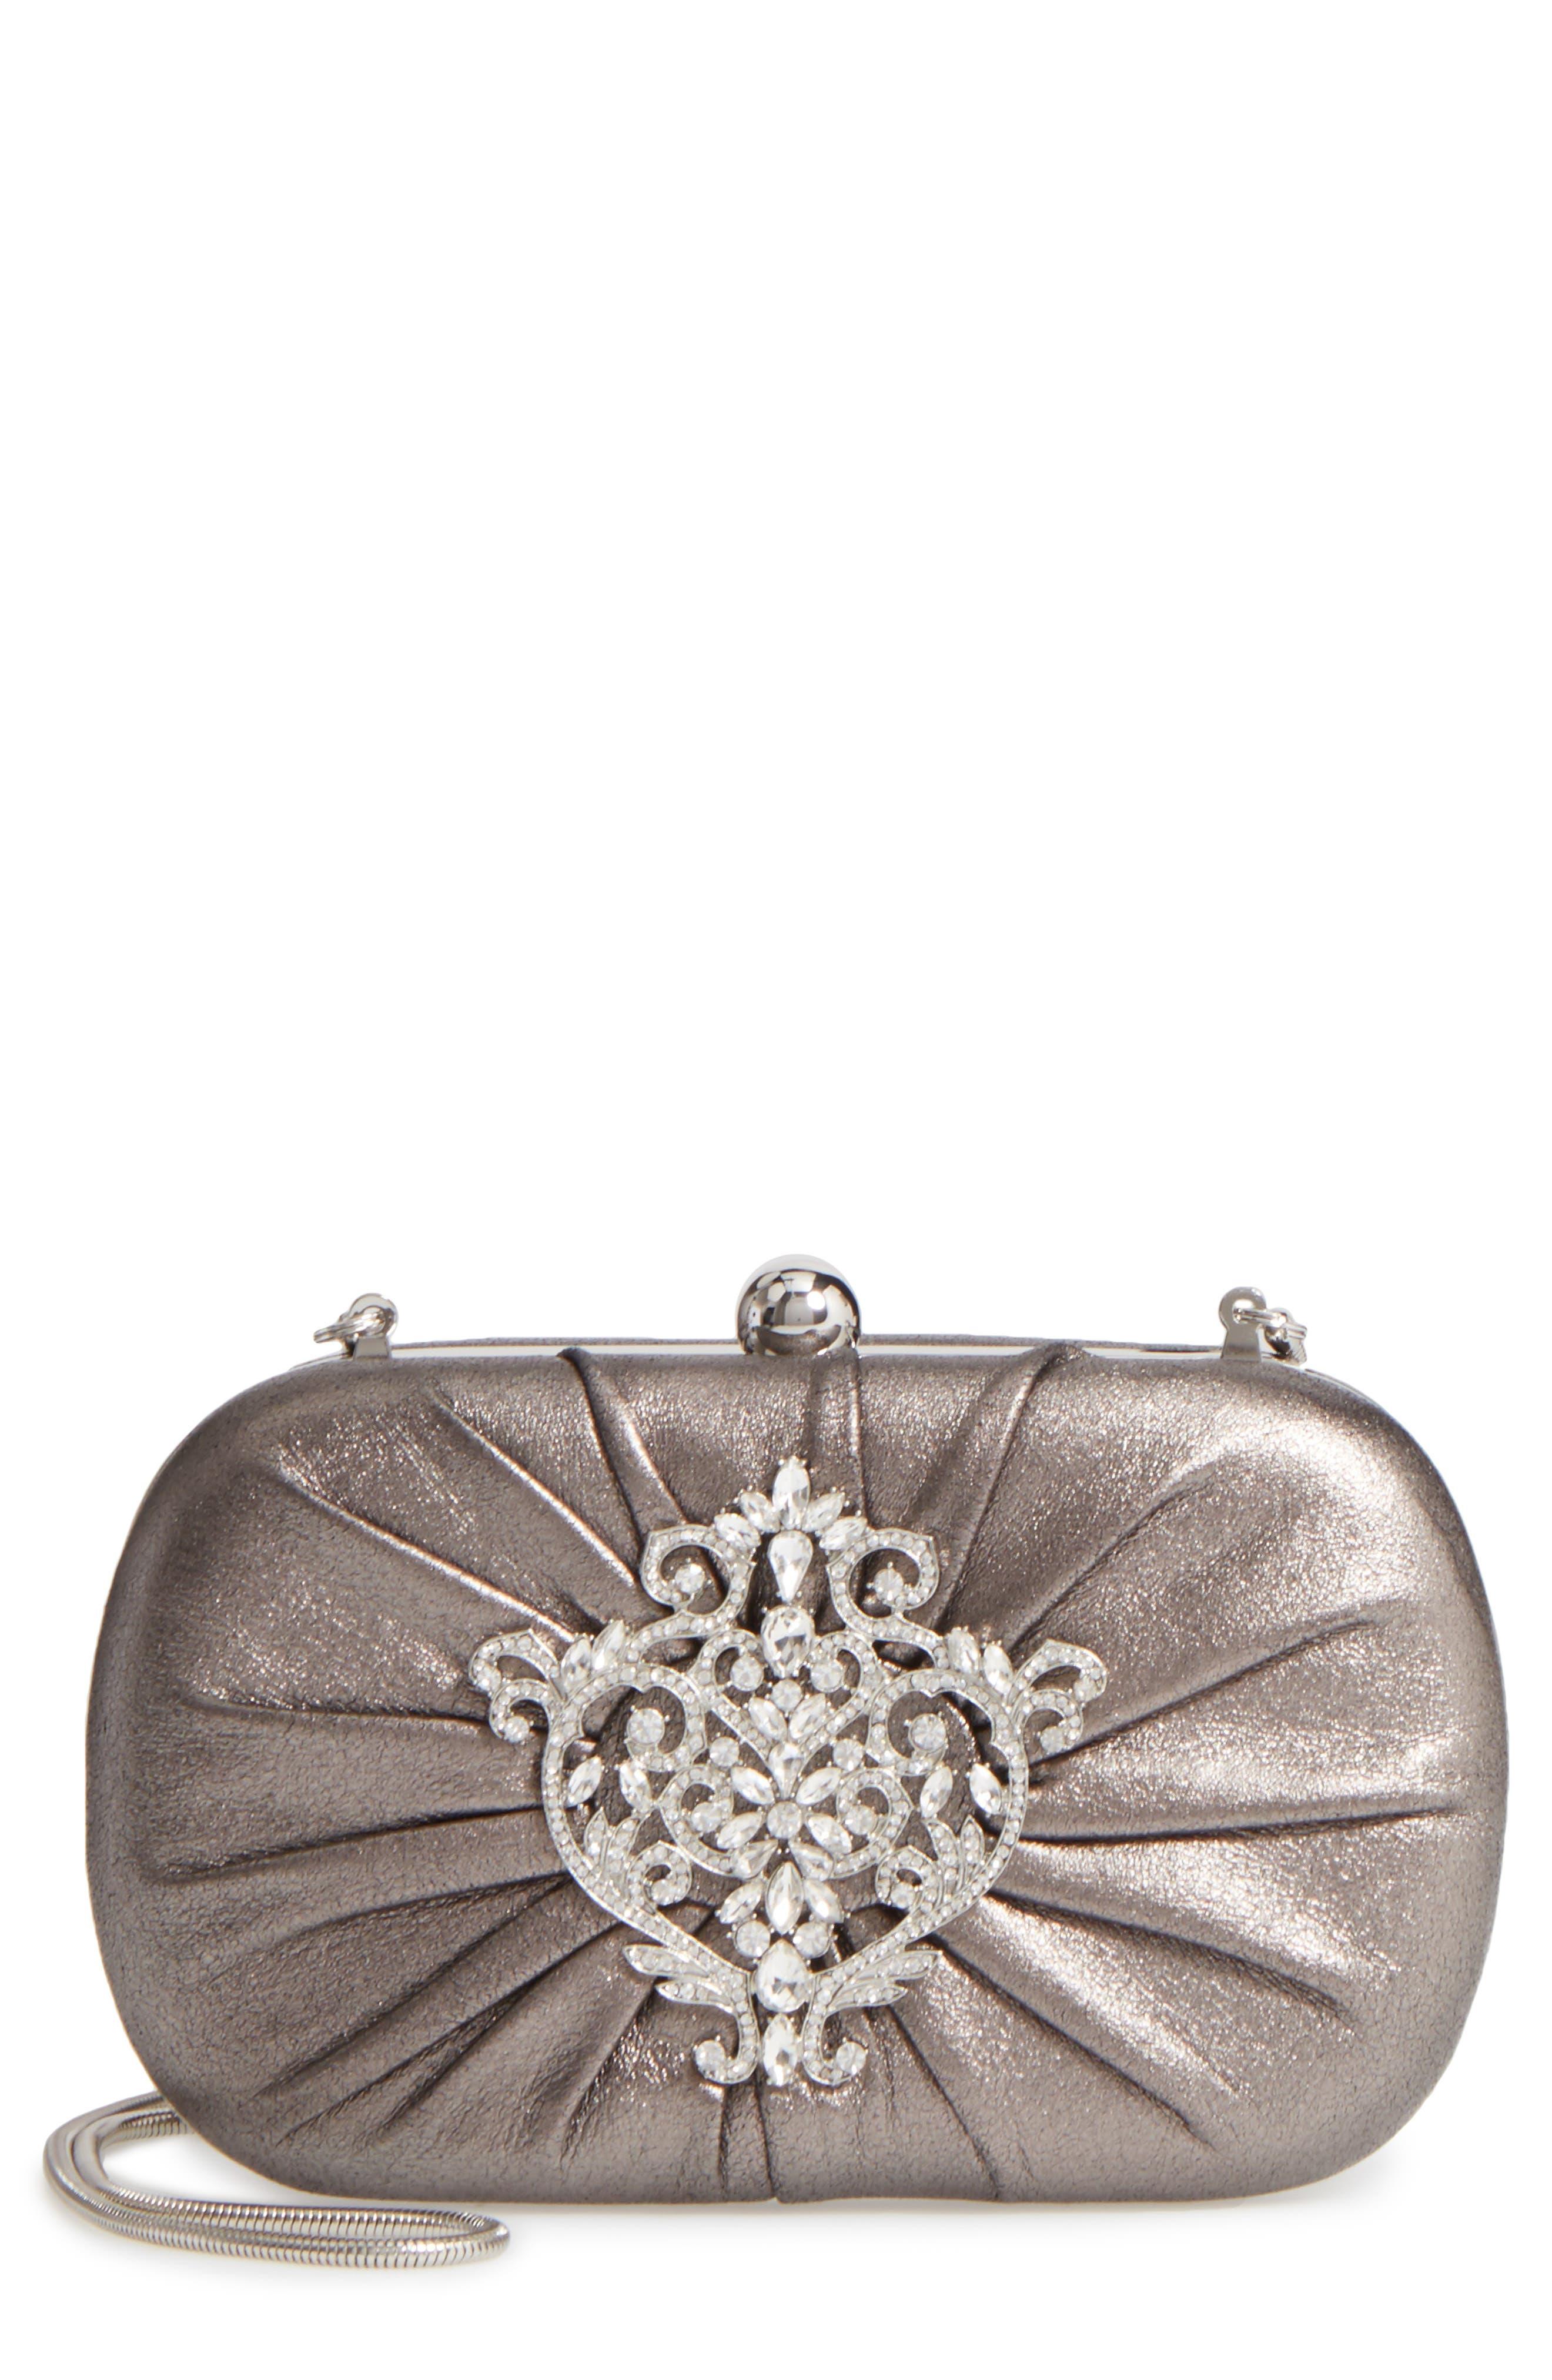 Alternate Image 1 Selected - Badgley Mischka Diva Metallic Leather Clutch